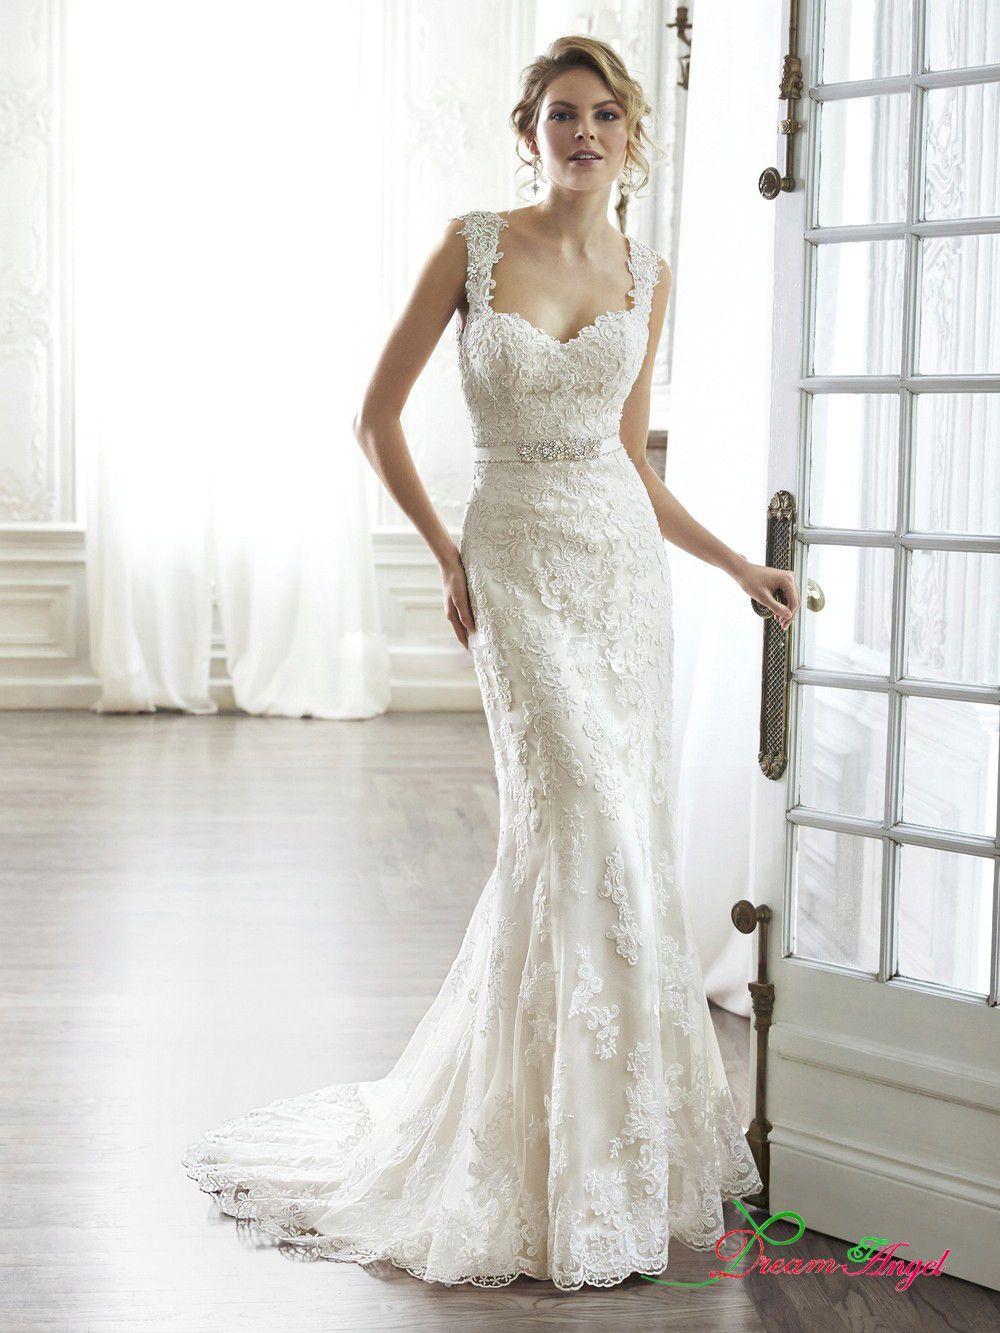 New Fashionable Sweetheart Backless Lace Mermaid Vestidos Fashion ...